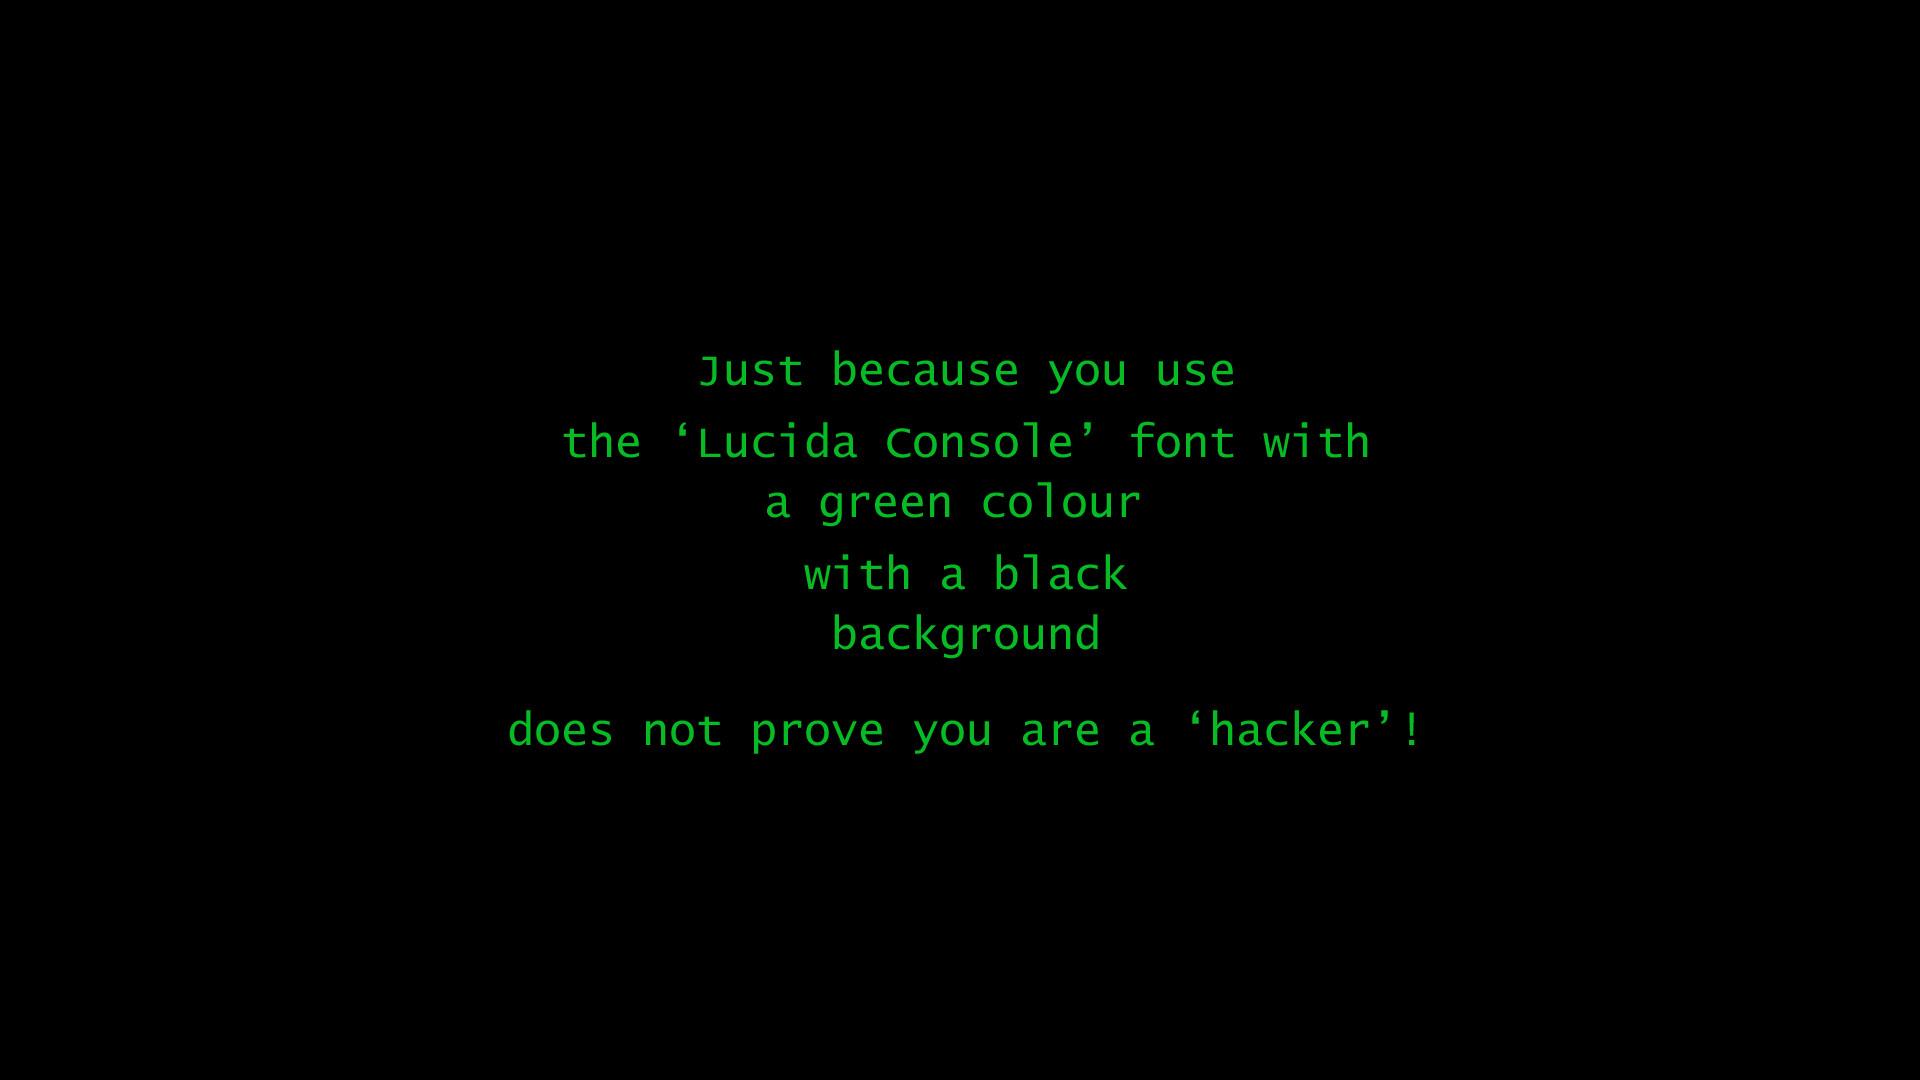 Hacker Black Green computer wallpaper